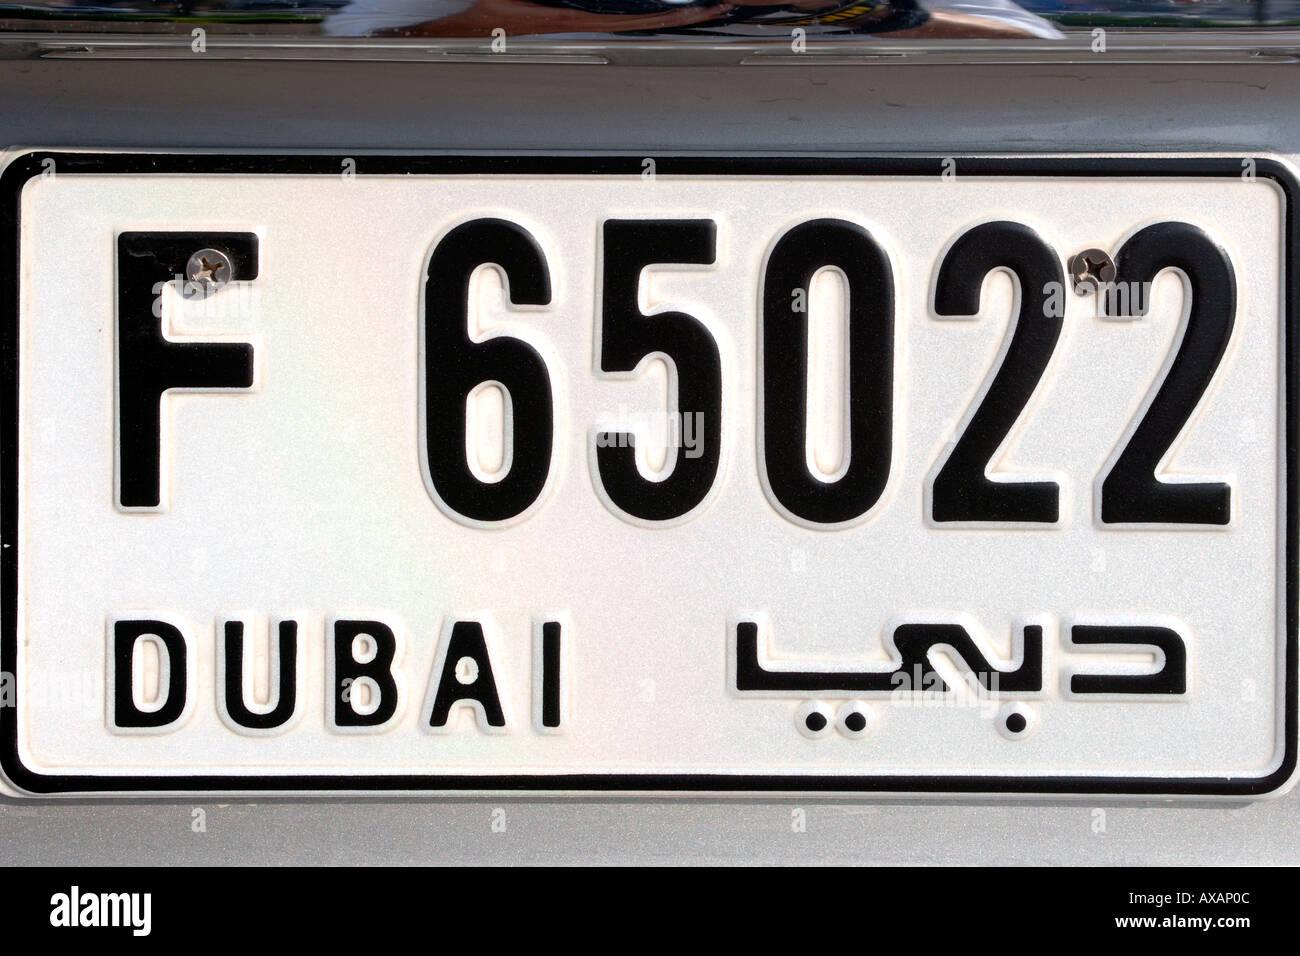 dubai license plate photos dubai license plate images alamy. Black Bedroom Furniture Sets. Home Design Ideas